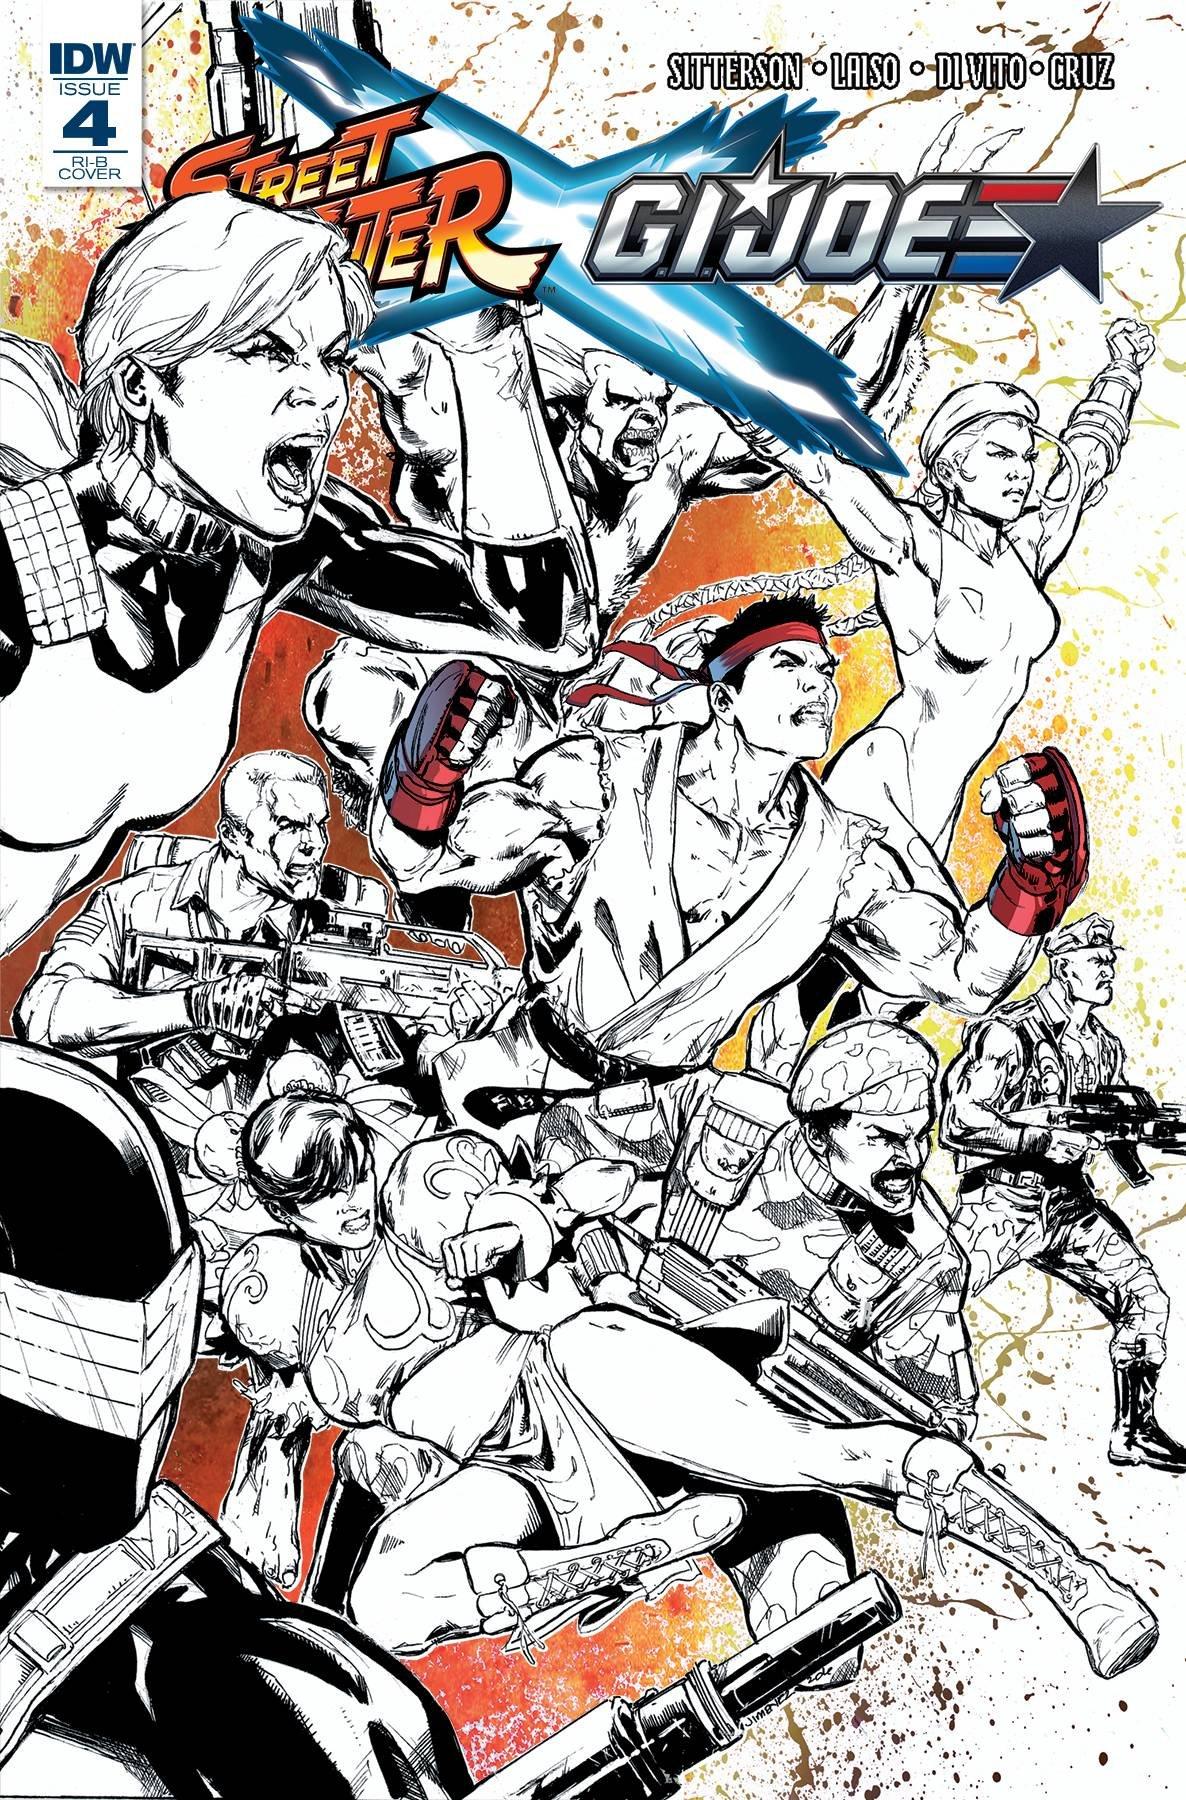 Street Fighter X G.I. JOE 004 (May 2016) (Retailer Incentive B)